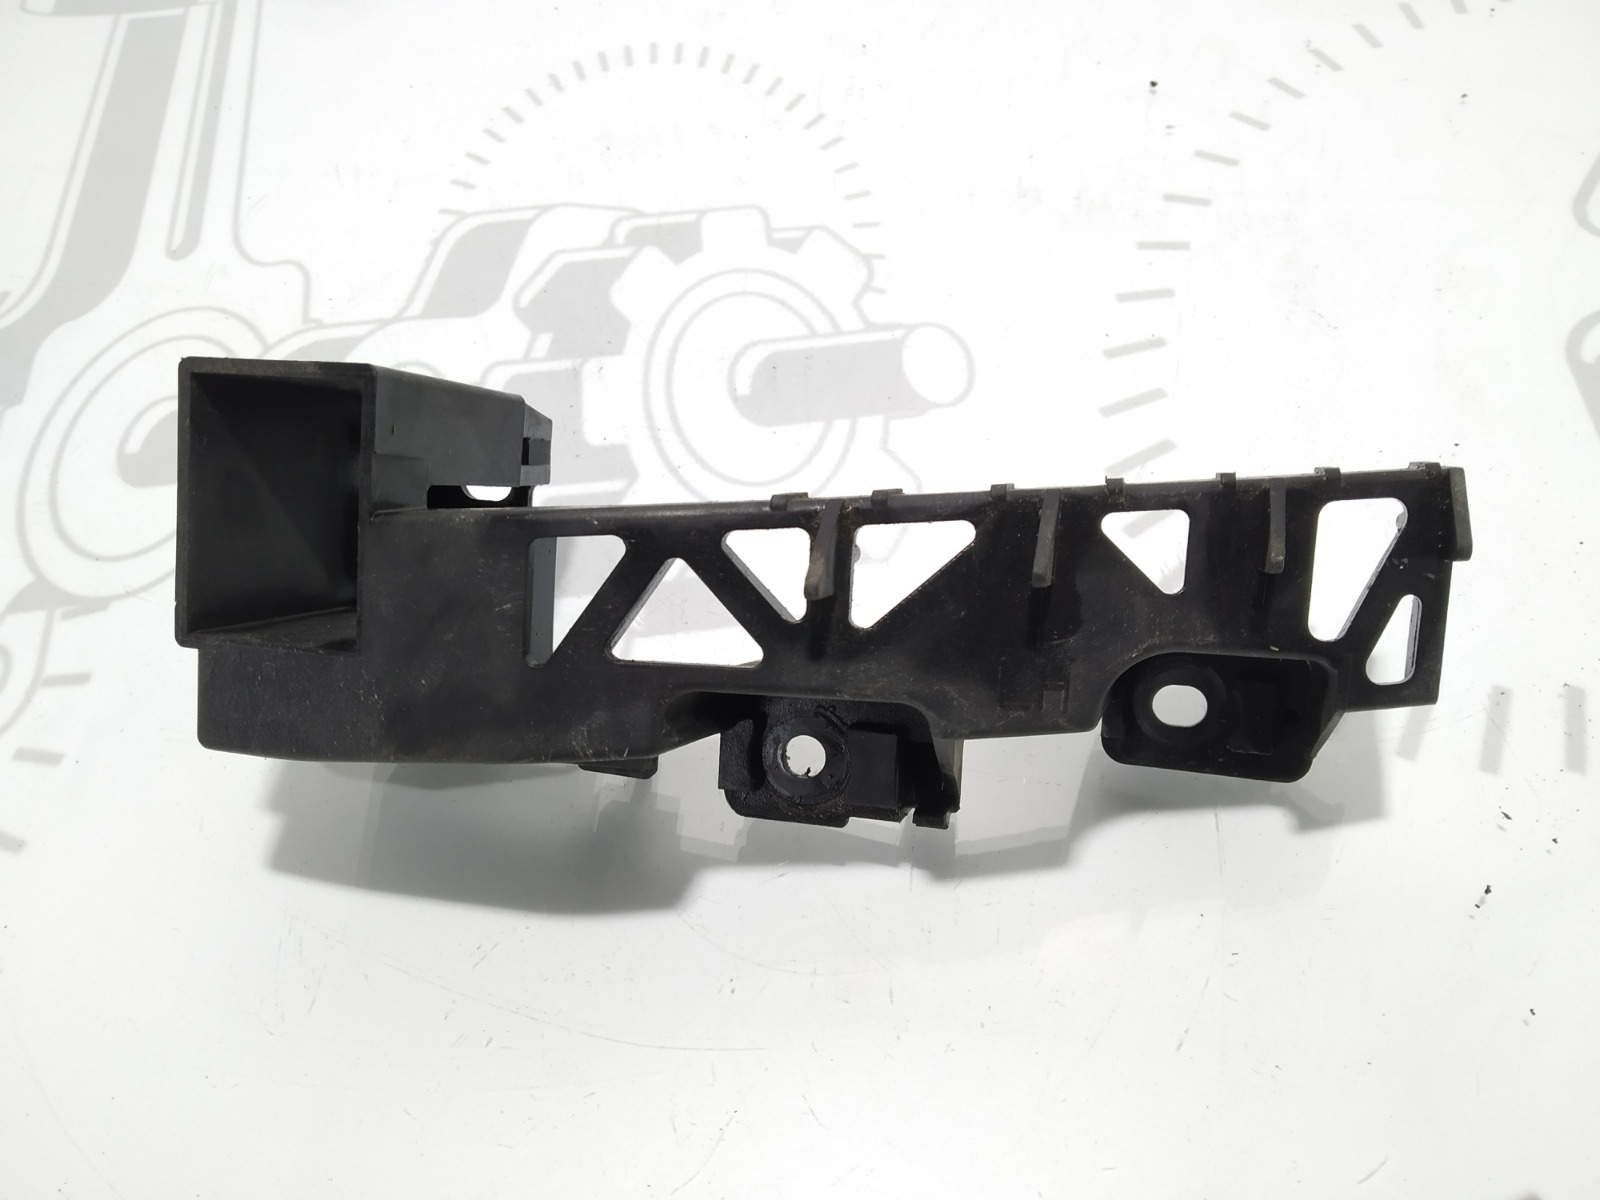 Кронштейн крепления бампера переднего Mazda 5 2.0 TD 2006 (б/у)